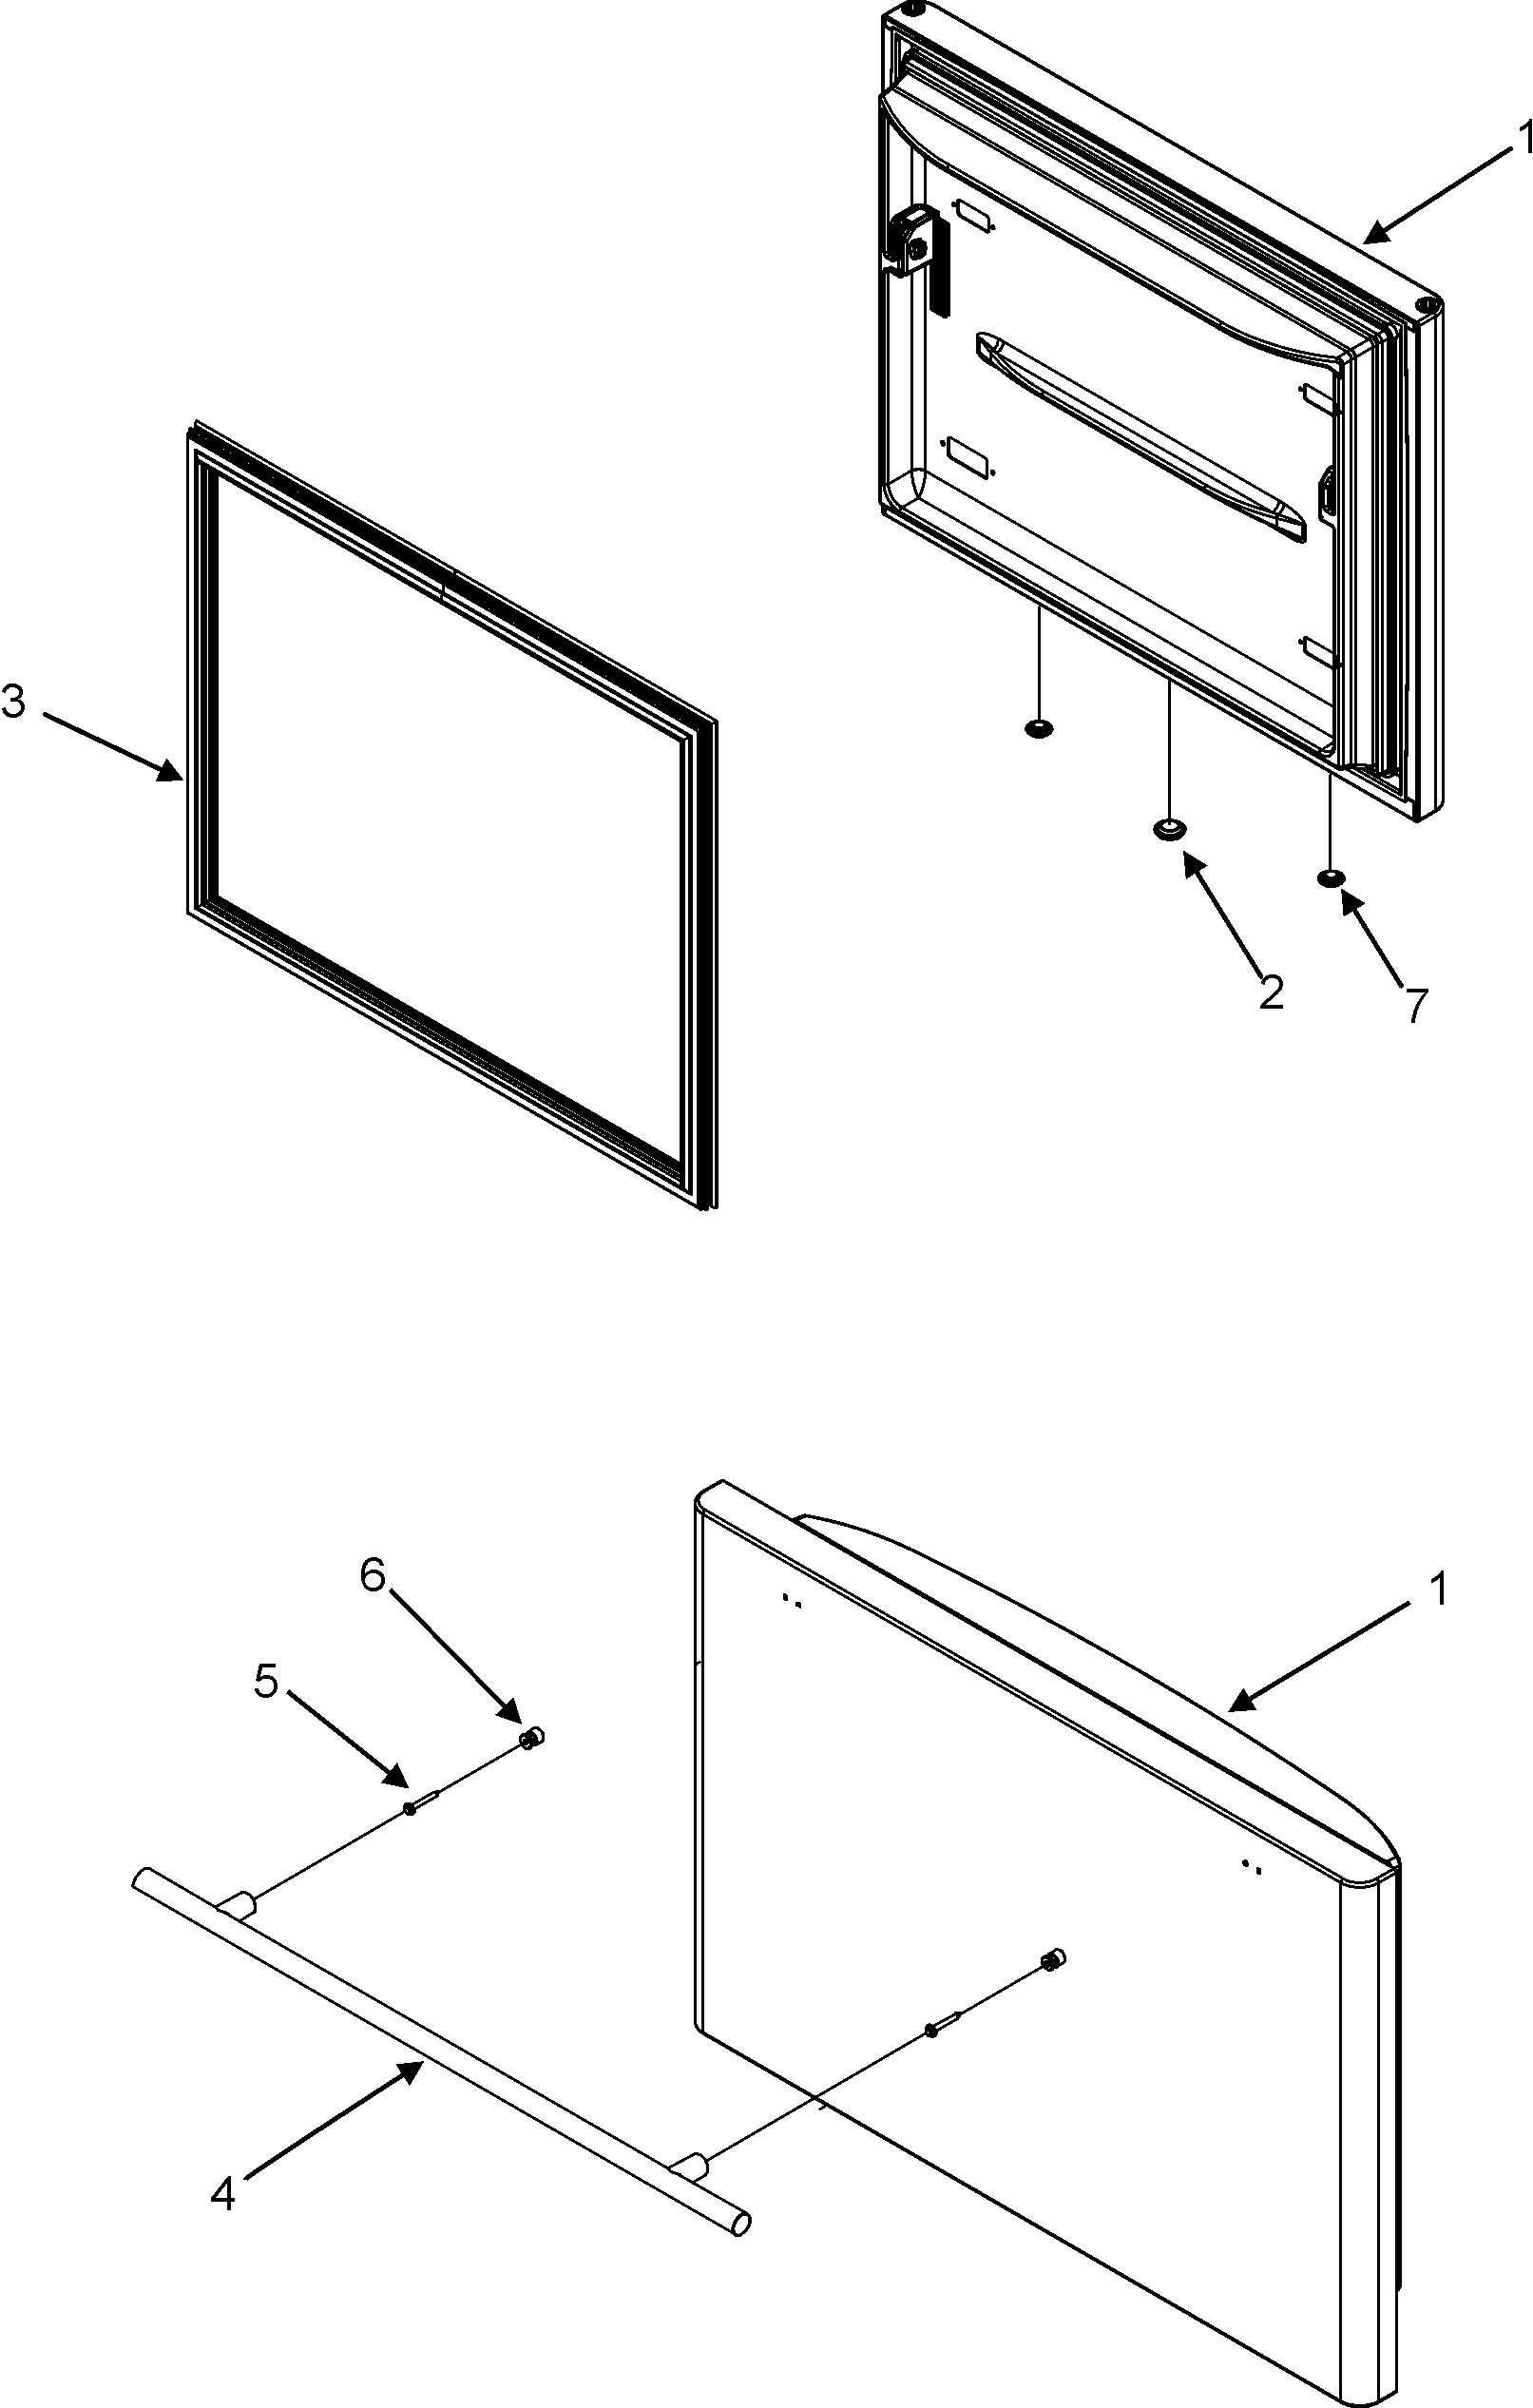 Jenn-Air model JBR2088HES bottom-mount refrigerator